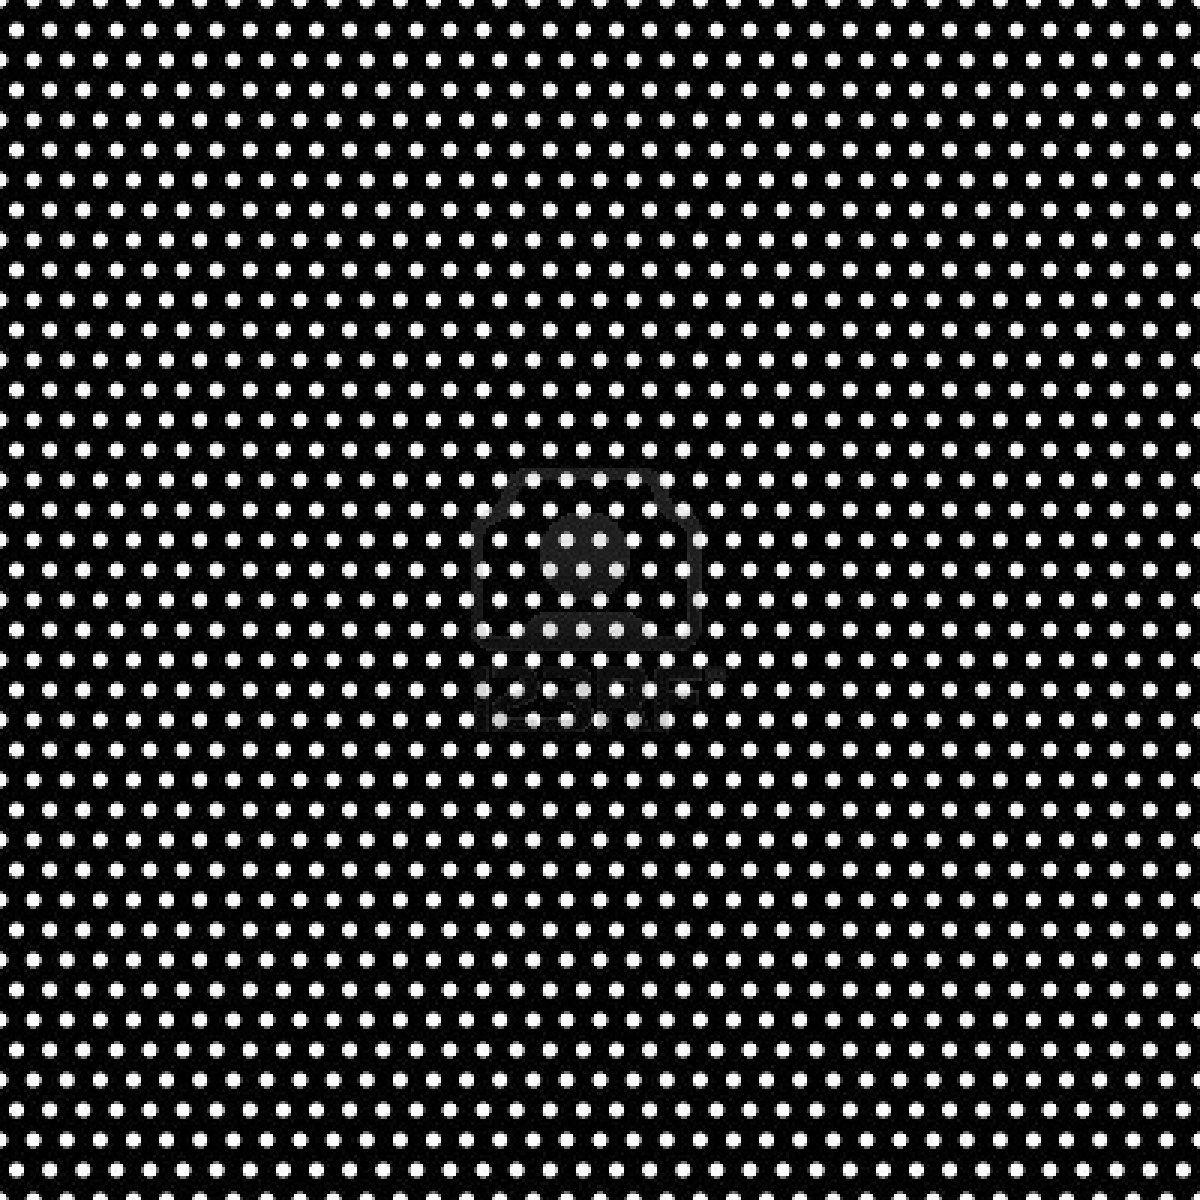 Stock Photo Polka dots, Black backgrounds, Polka dot